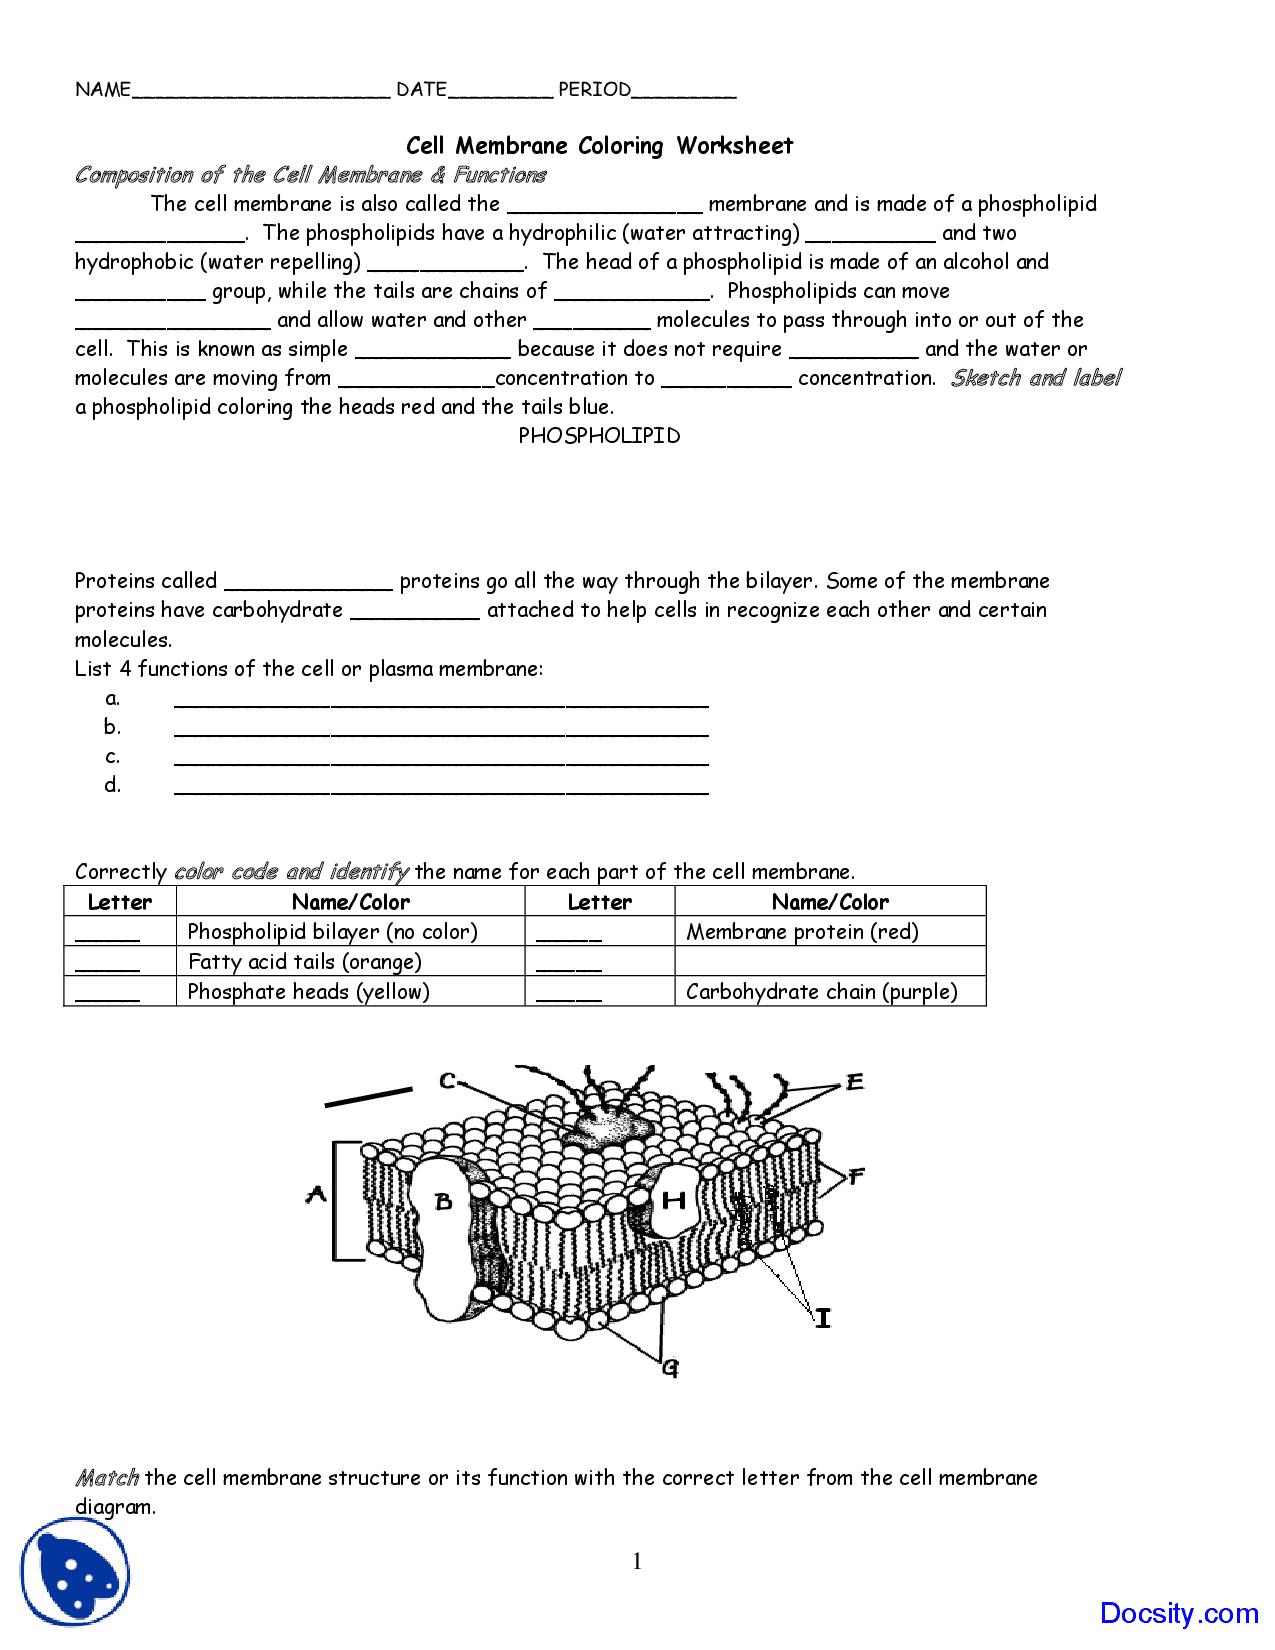 Cell Membrane Coloring Worksheet